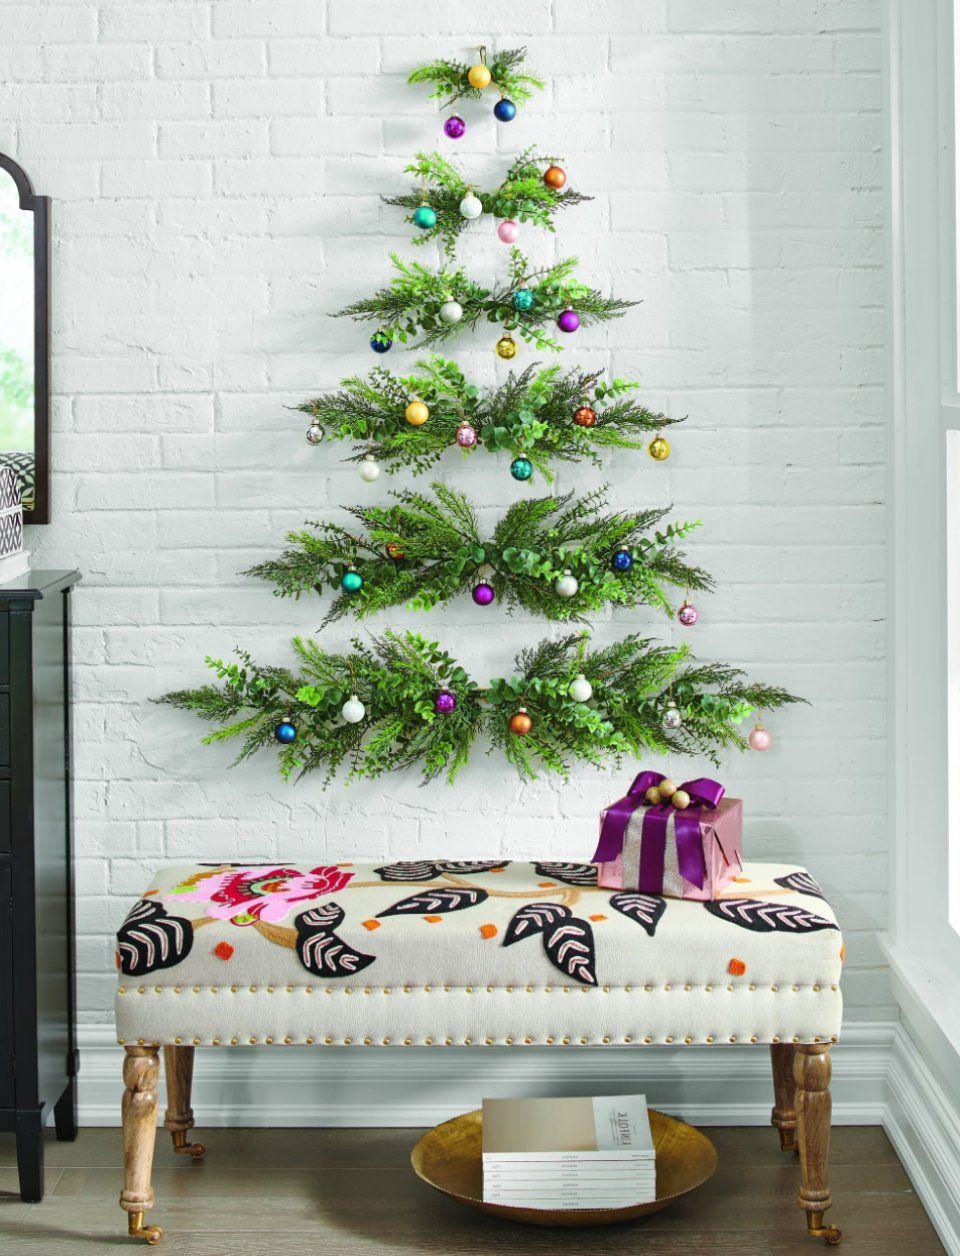 Pin By Tonda Guisasola On Nail Designs Official In 2020 Easy Christmas Diy Diy Christmas Tree Beautiful Christmas Decorations